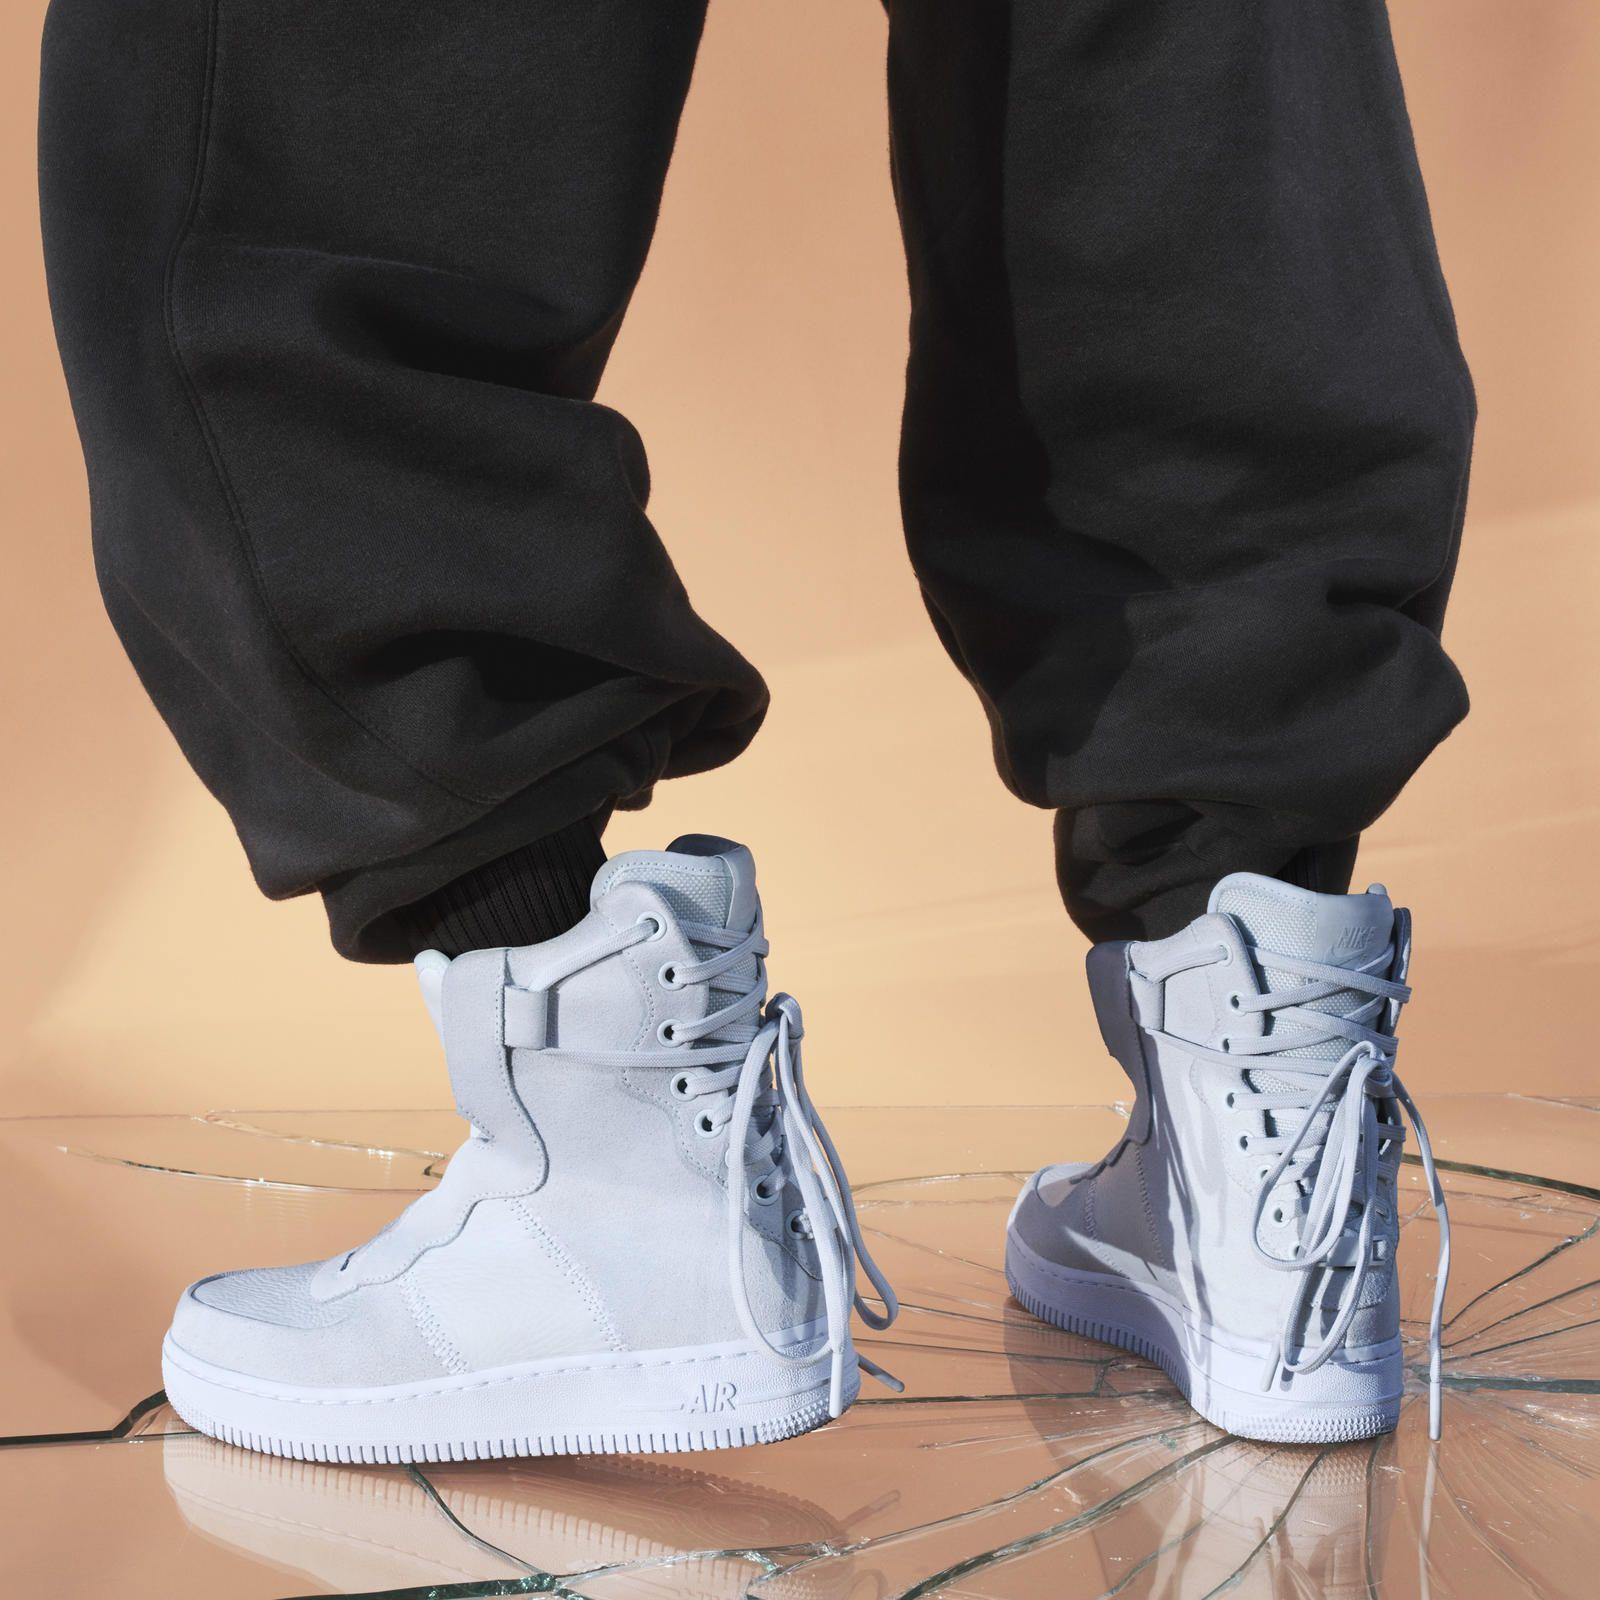 The Nike 1 Reimagined: Air Force 1 Womens and Air Jordan 1